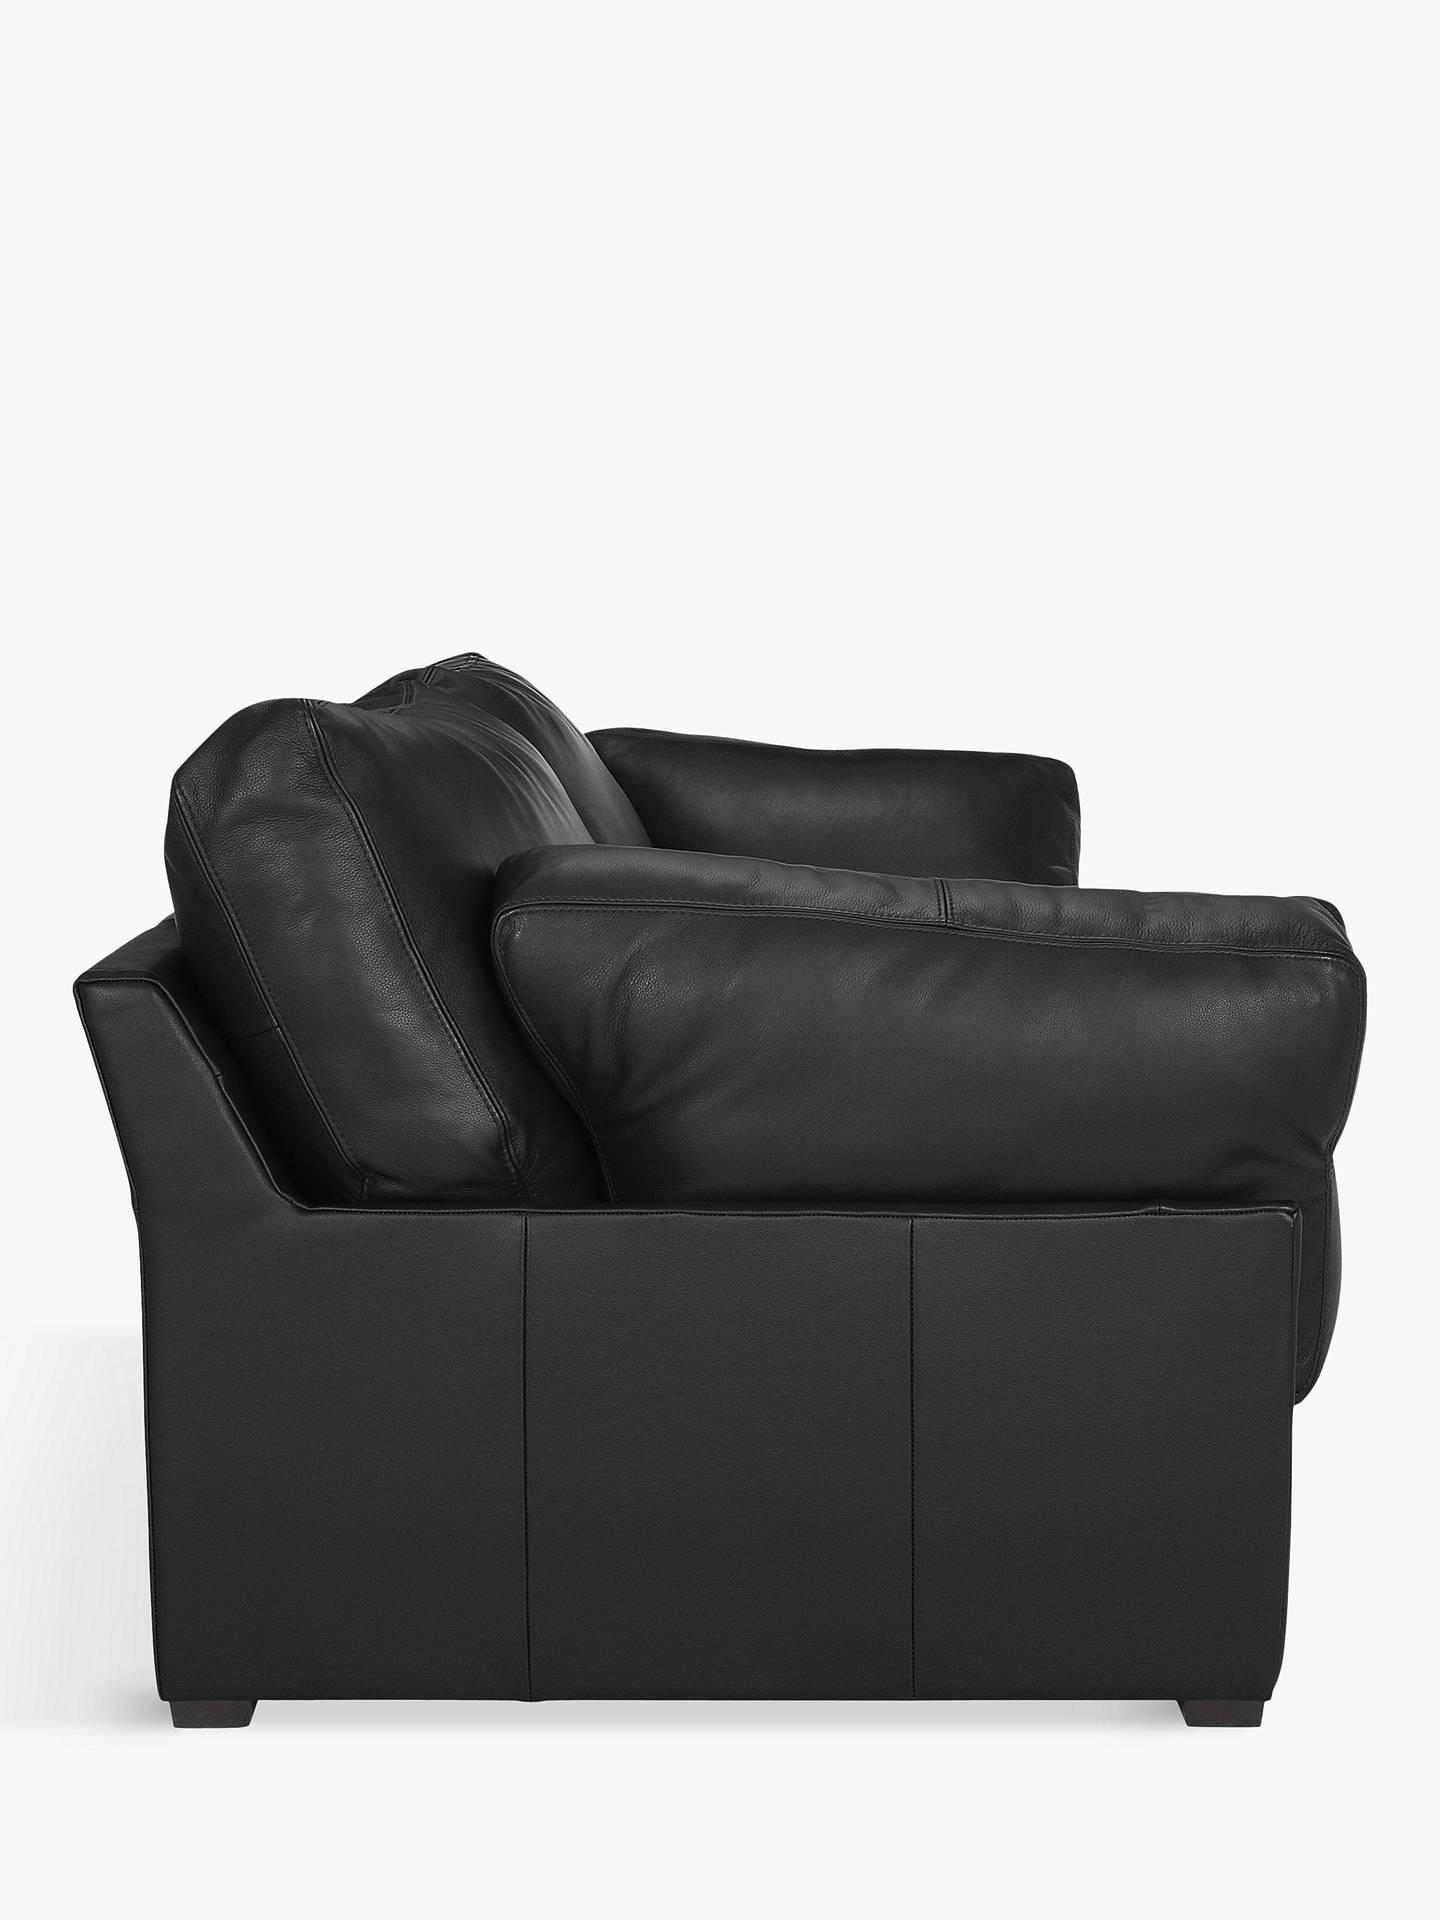 Stupendous John Lewis Partners Java Medium 2 Seater Leather Sofa Cjindustries Chair Design For Home Cjindustriesco